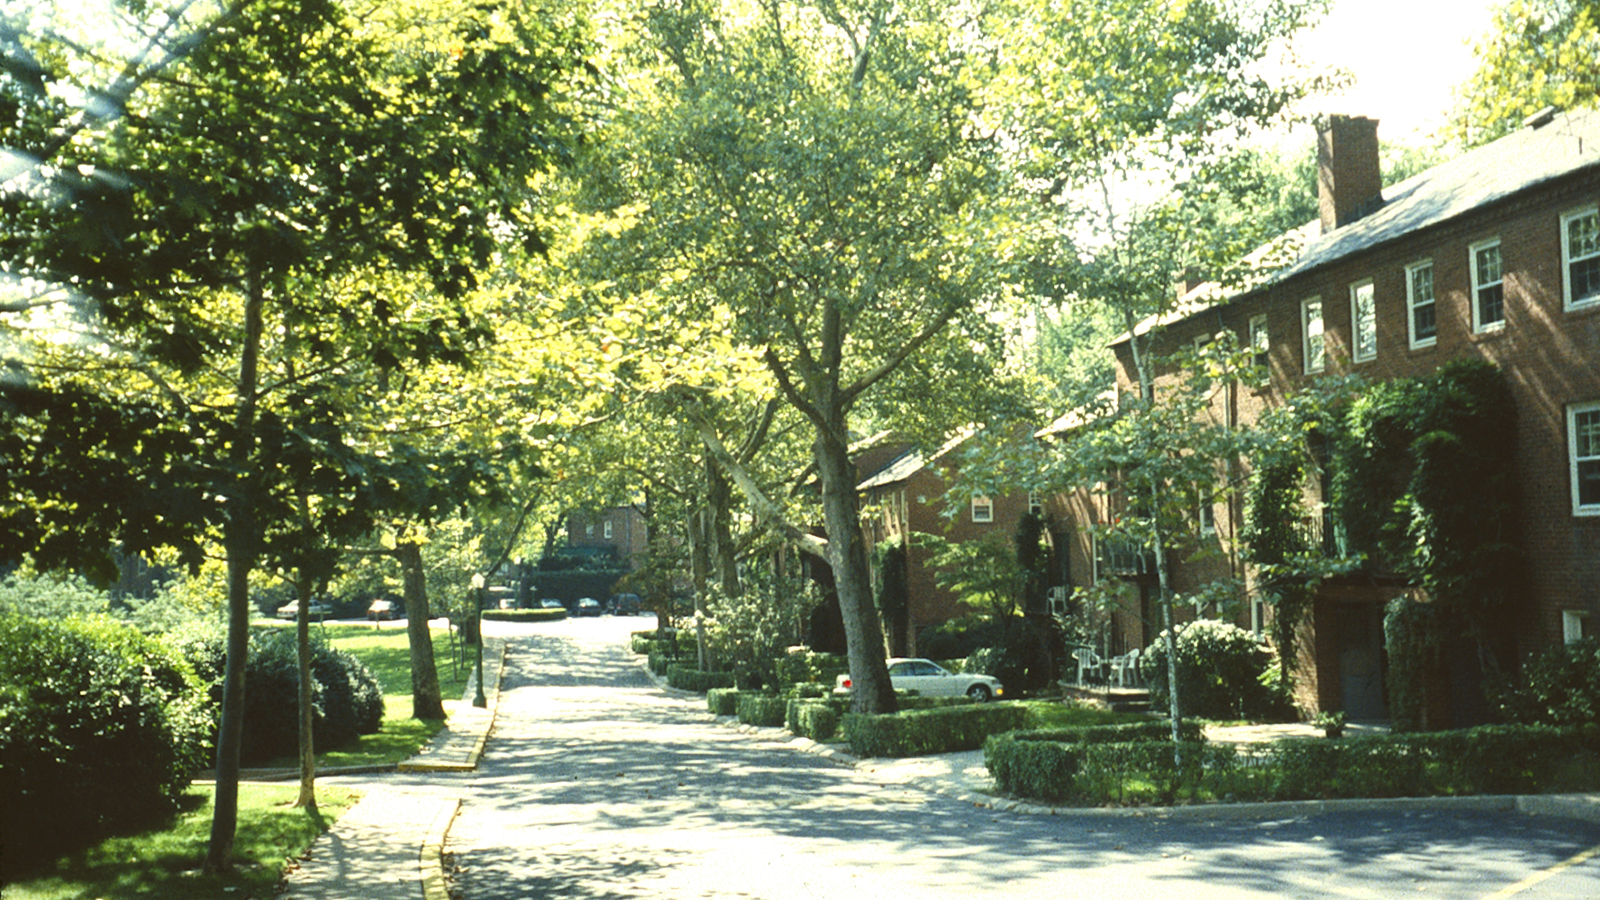 PA_Pittsburgh_ChathamVillage_signature_CharlesBirnbaum_1996_02.jpg